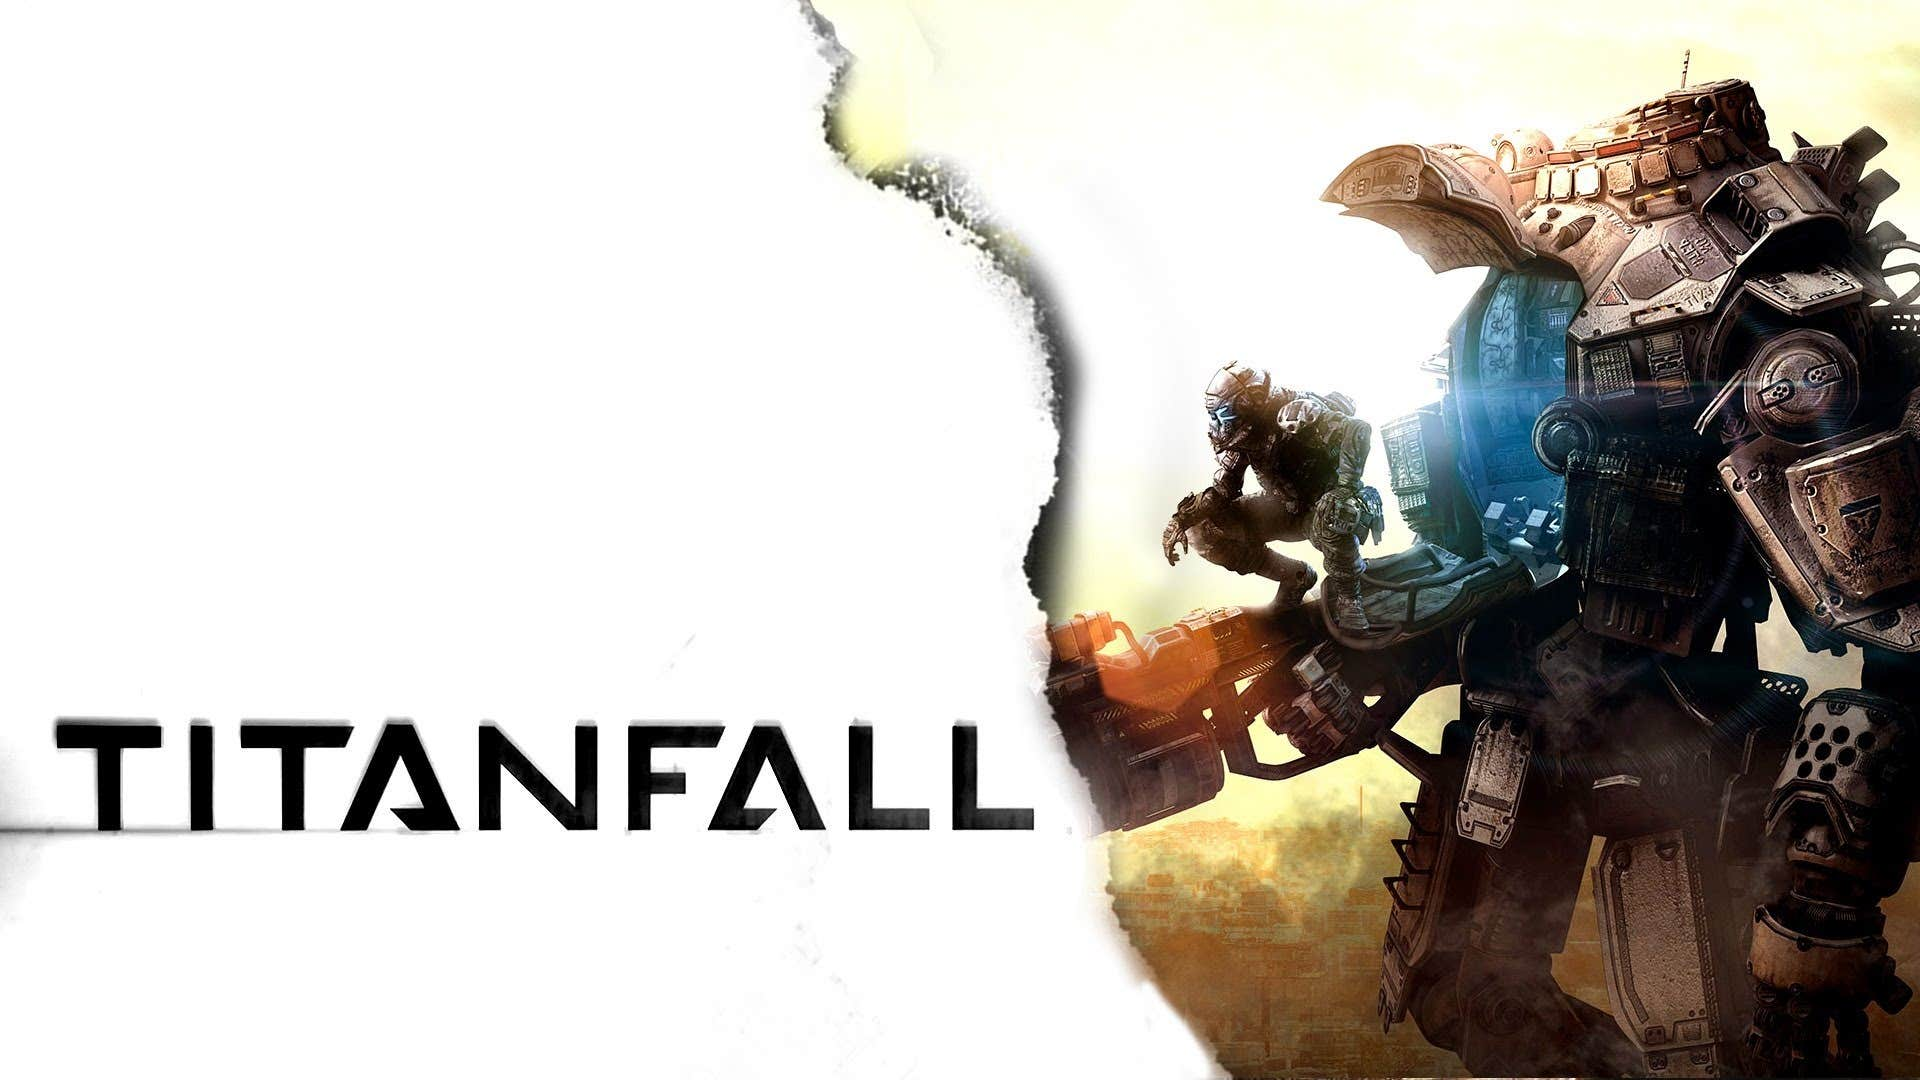 Play Titanfell